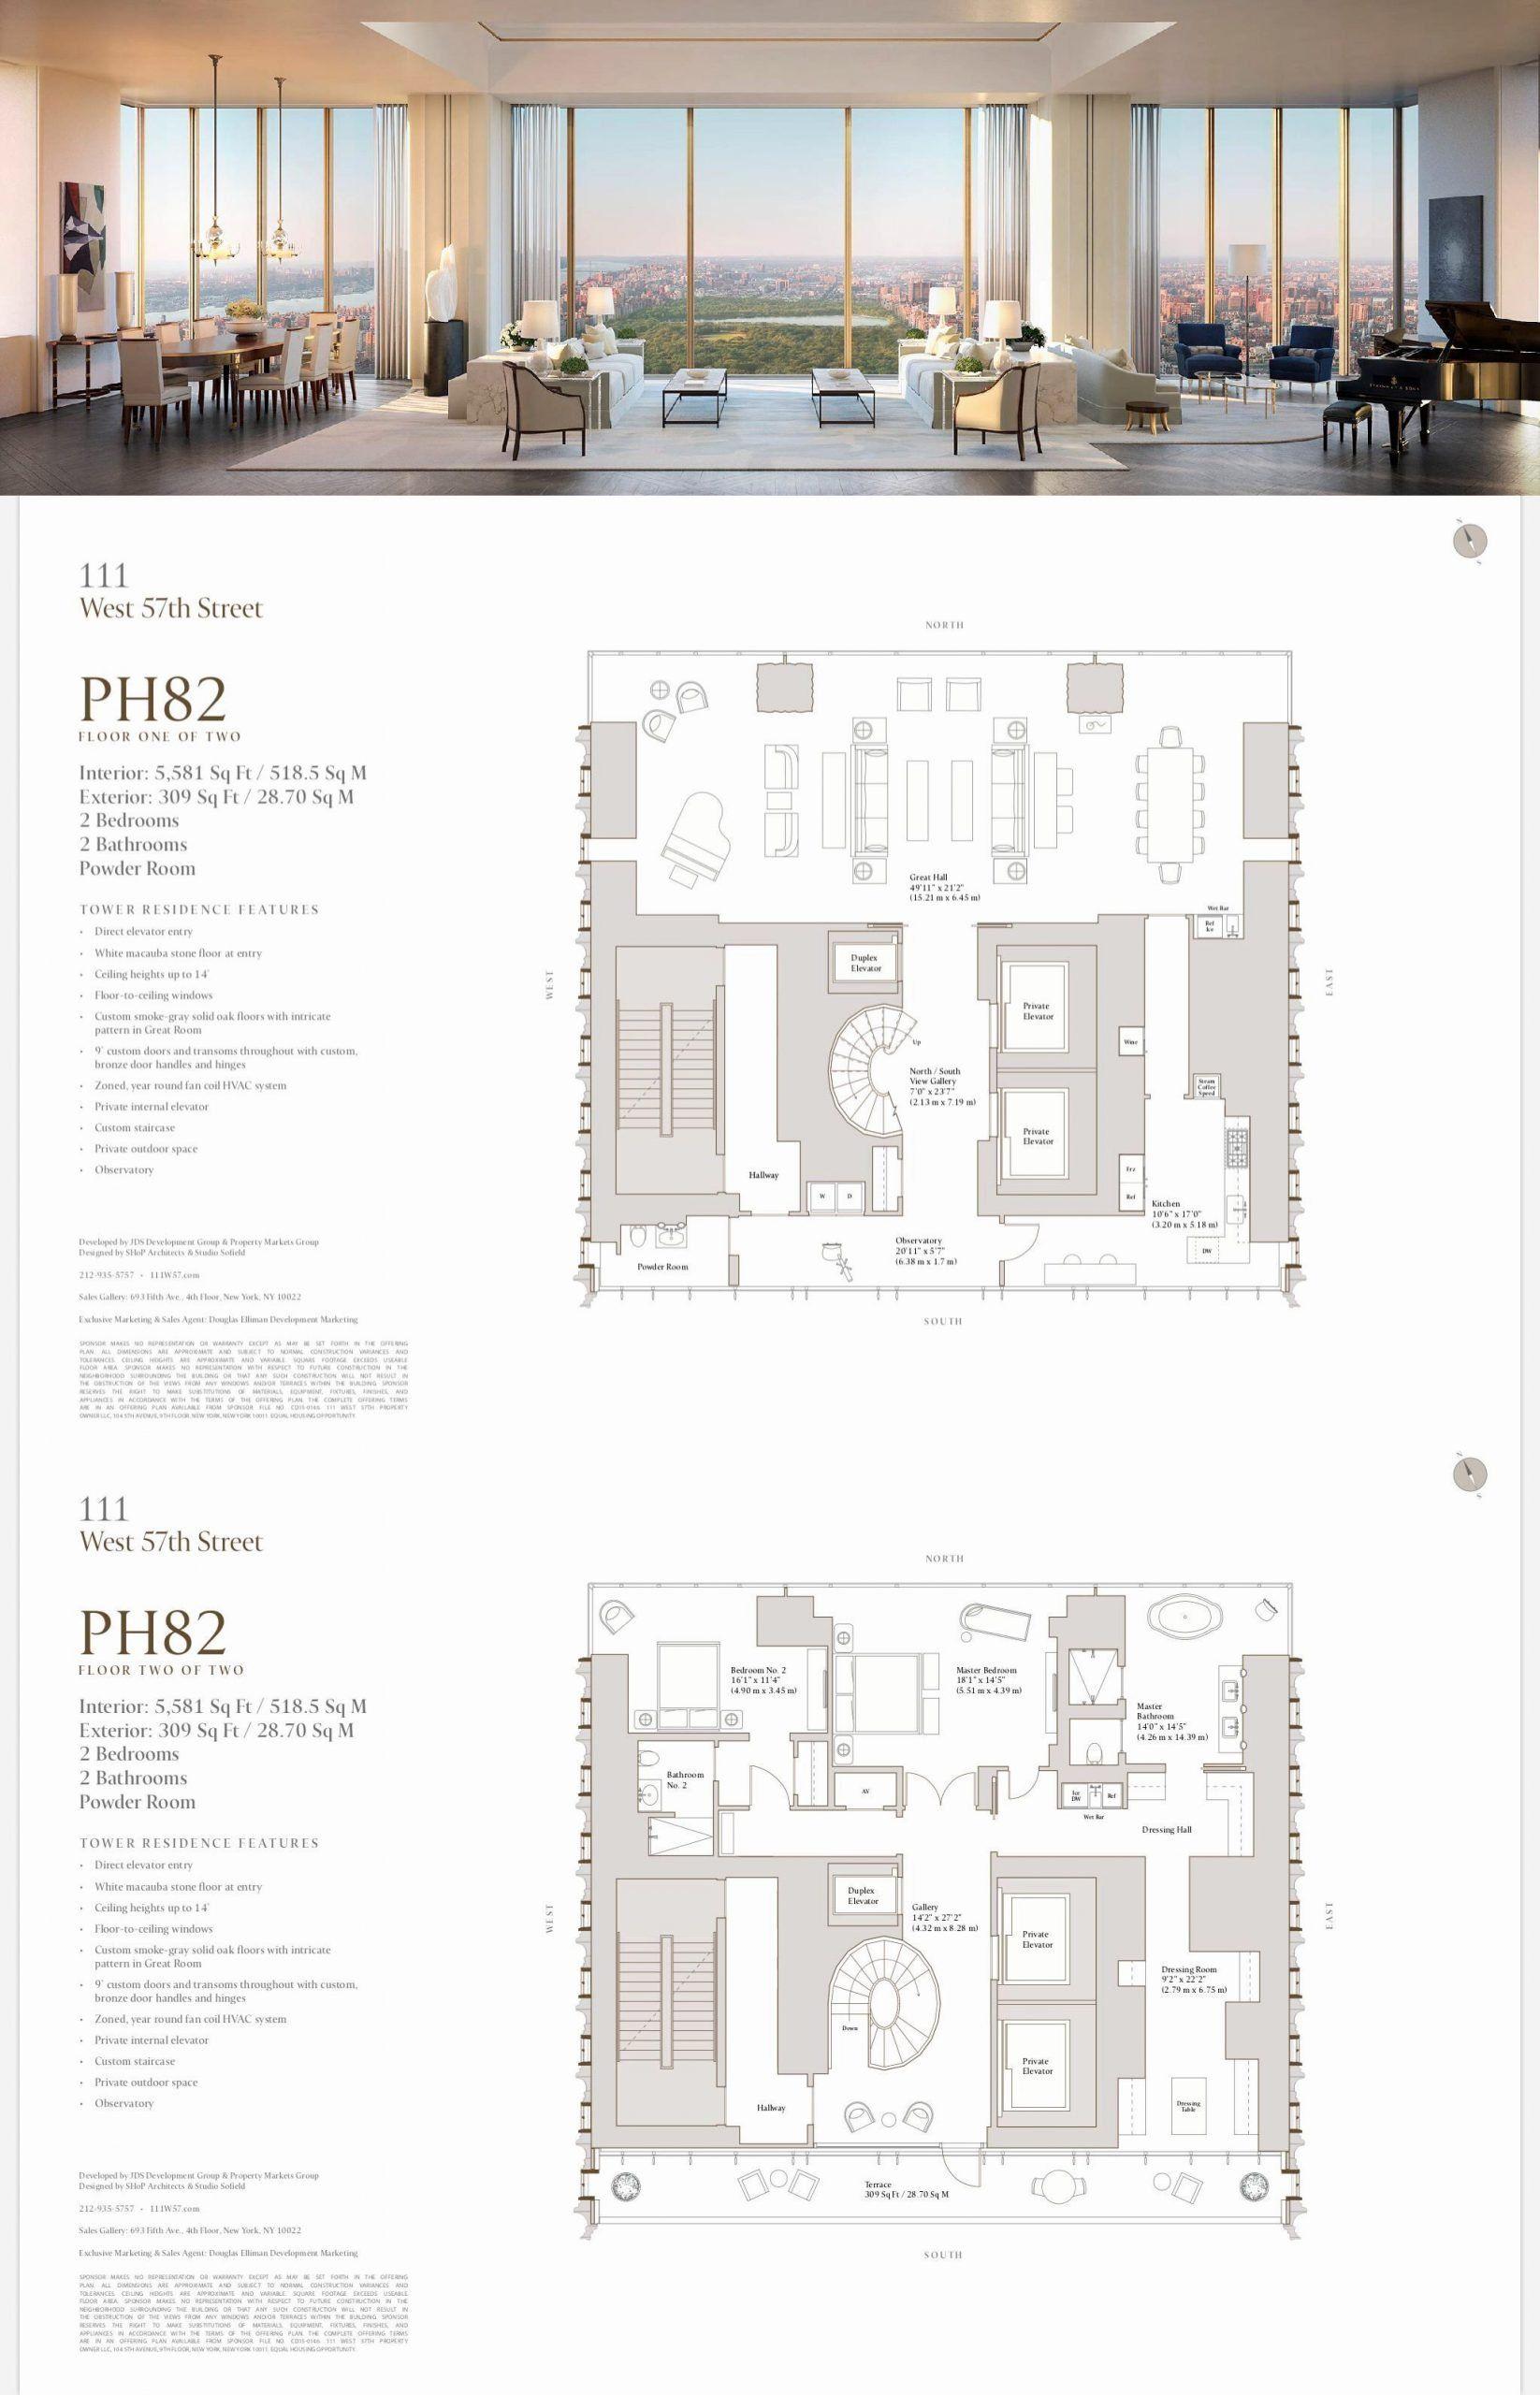 100000 Dollar House Plans Luxury 4635 Best House Plans Images In 2020 In 2020 Modern House Plans House Plans Craftsman House Plans